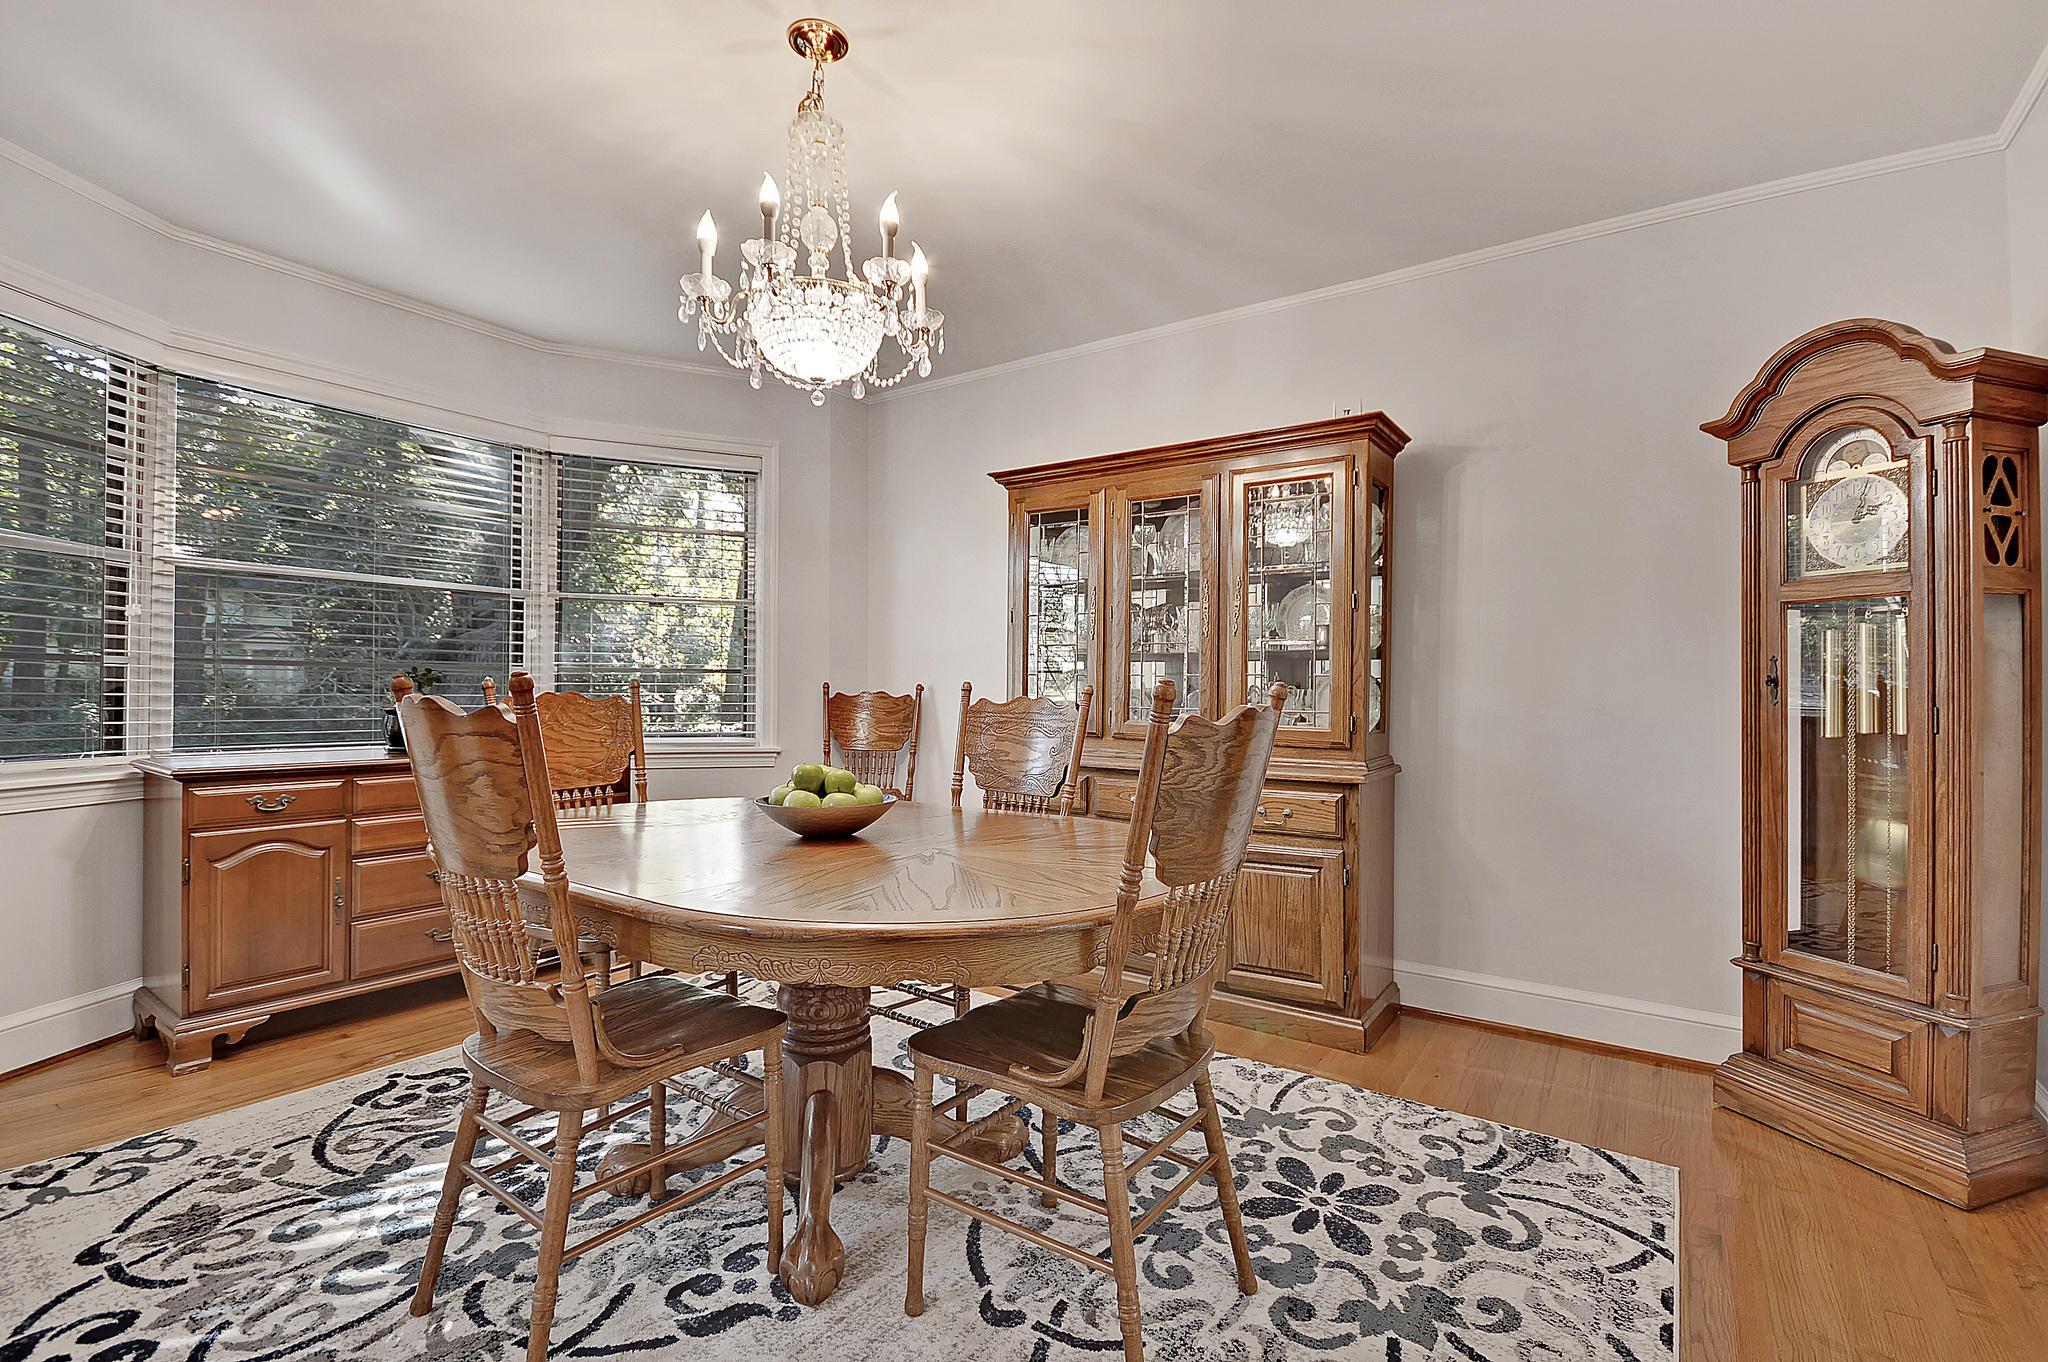 Edgewater Park Homes For Sale - 1356 Emory, Charleston, SC - 45